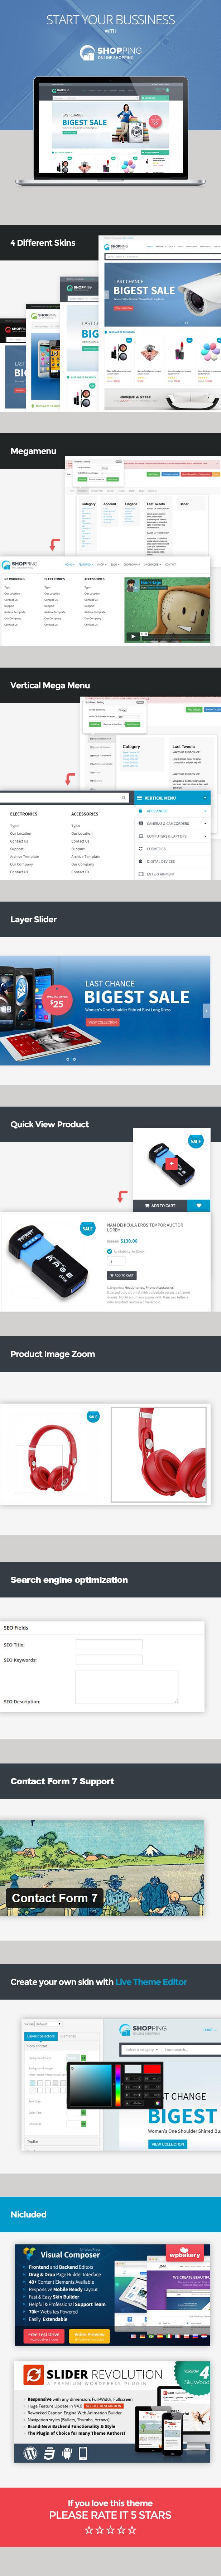 Shopping WooCommerce Responsive WordPress Theme - 5